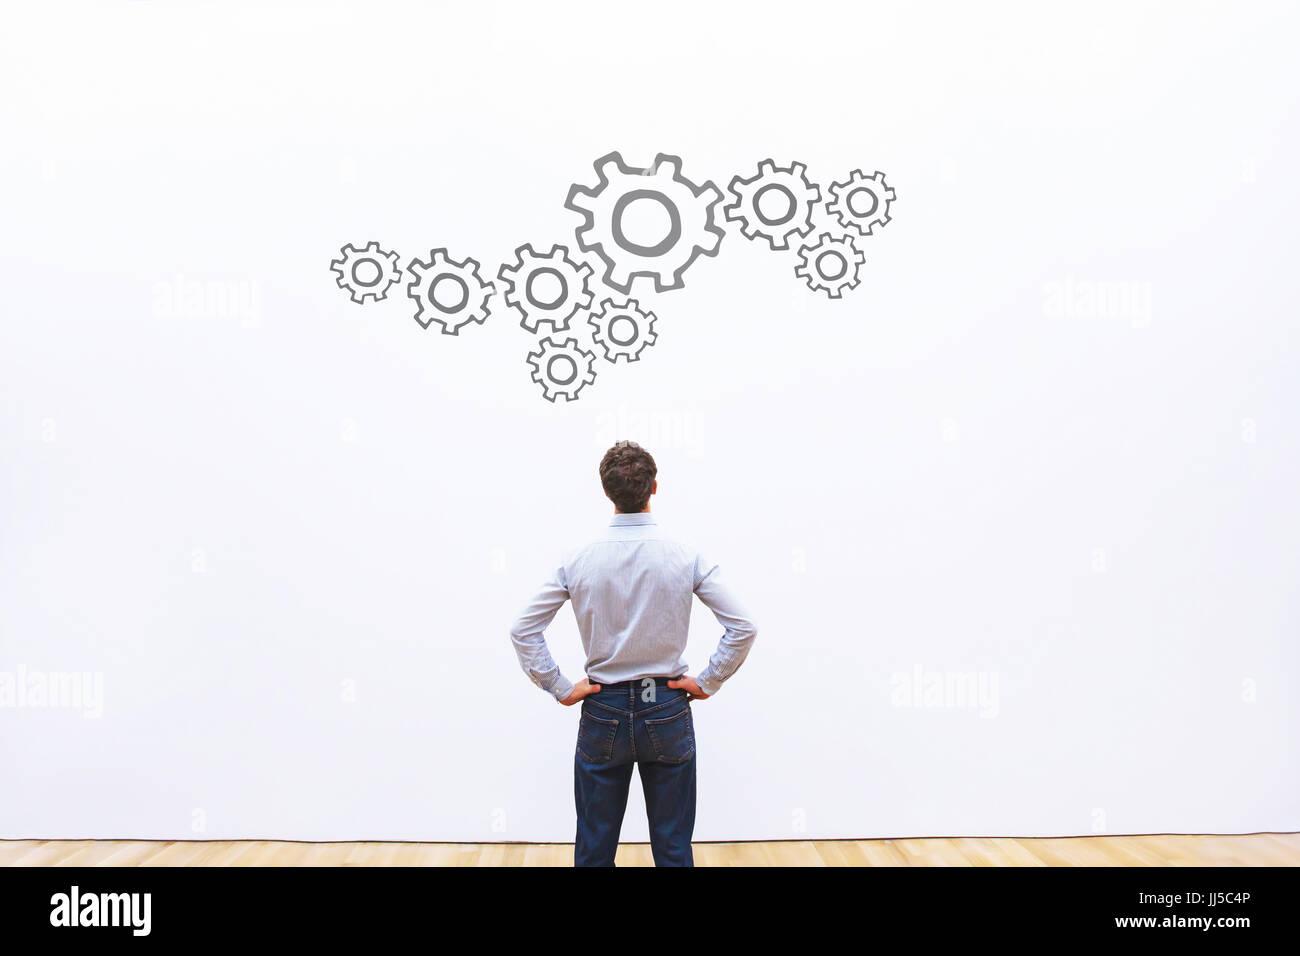 Verfahrenskonzept, Business-Mechanismus, transformation Stockbild